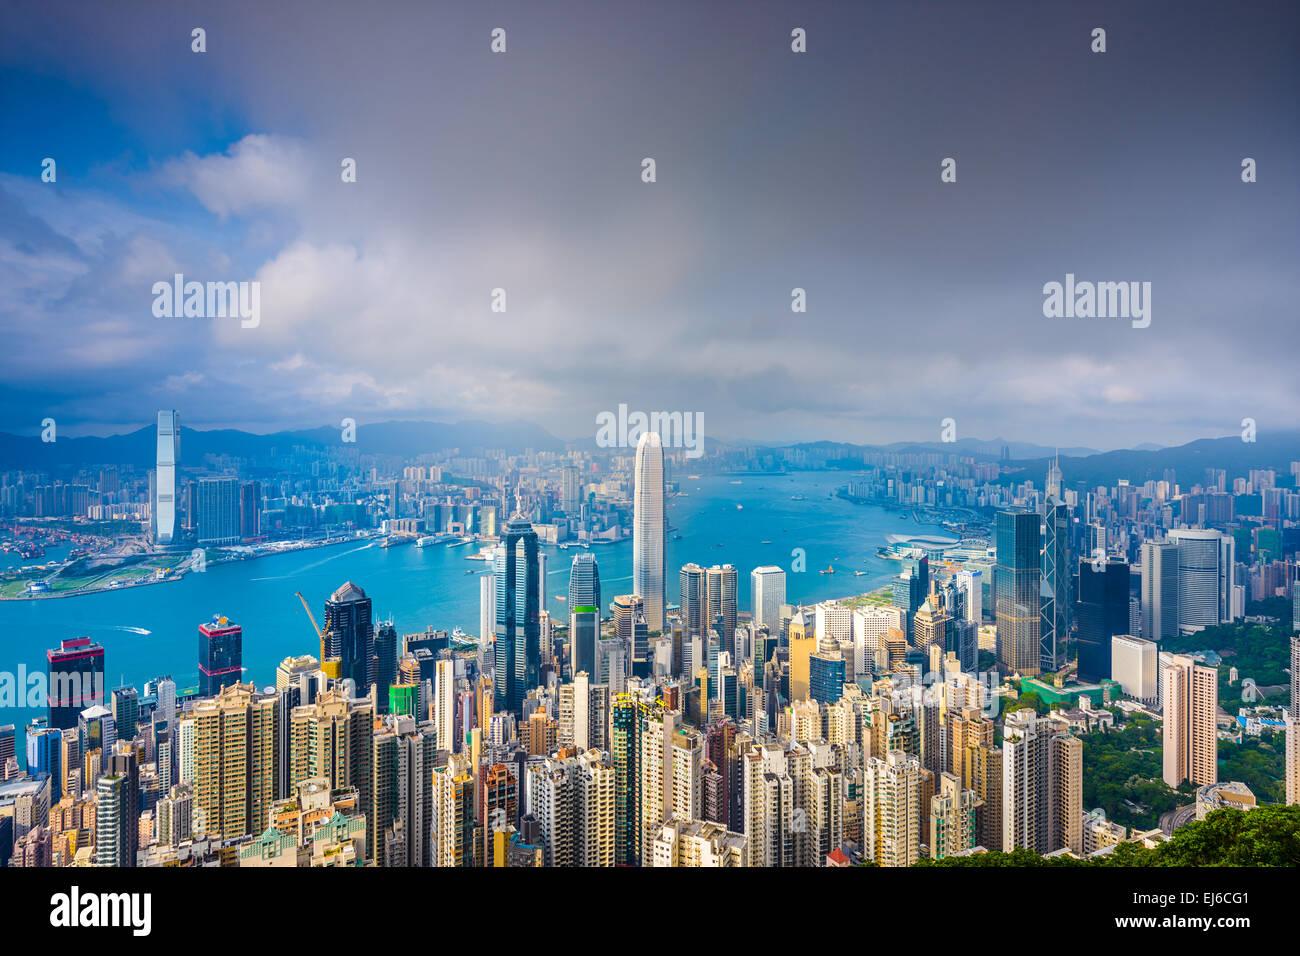 Hong Kong, China cityscape from Victoria Peak. - Stock Image